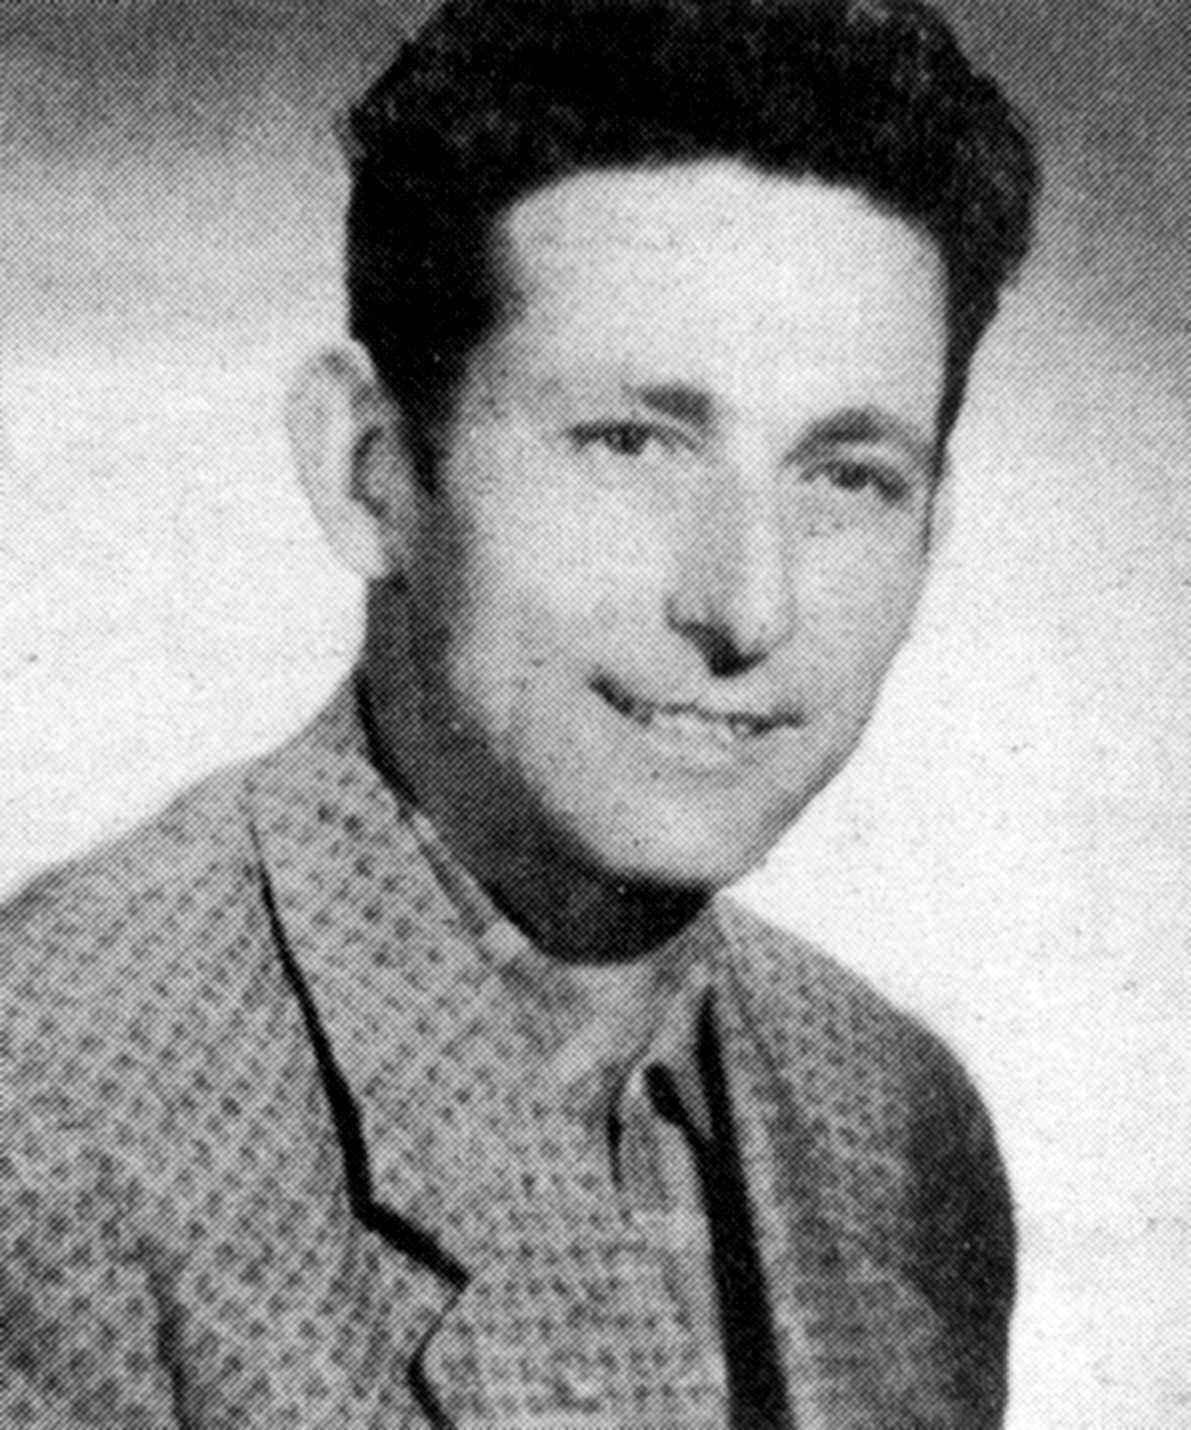 Luis Sos Yagüe